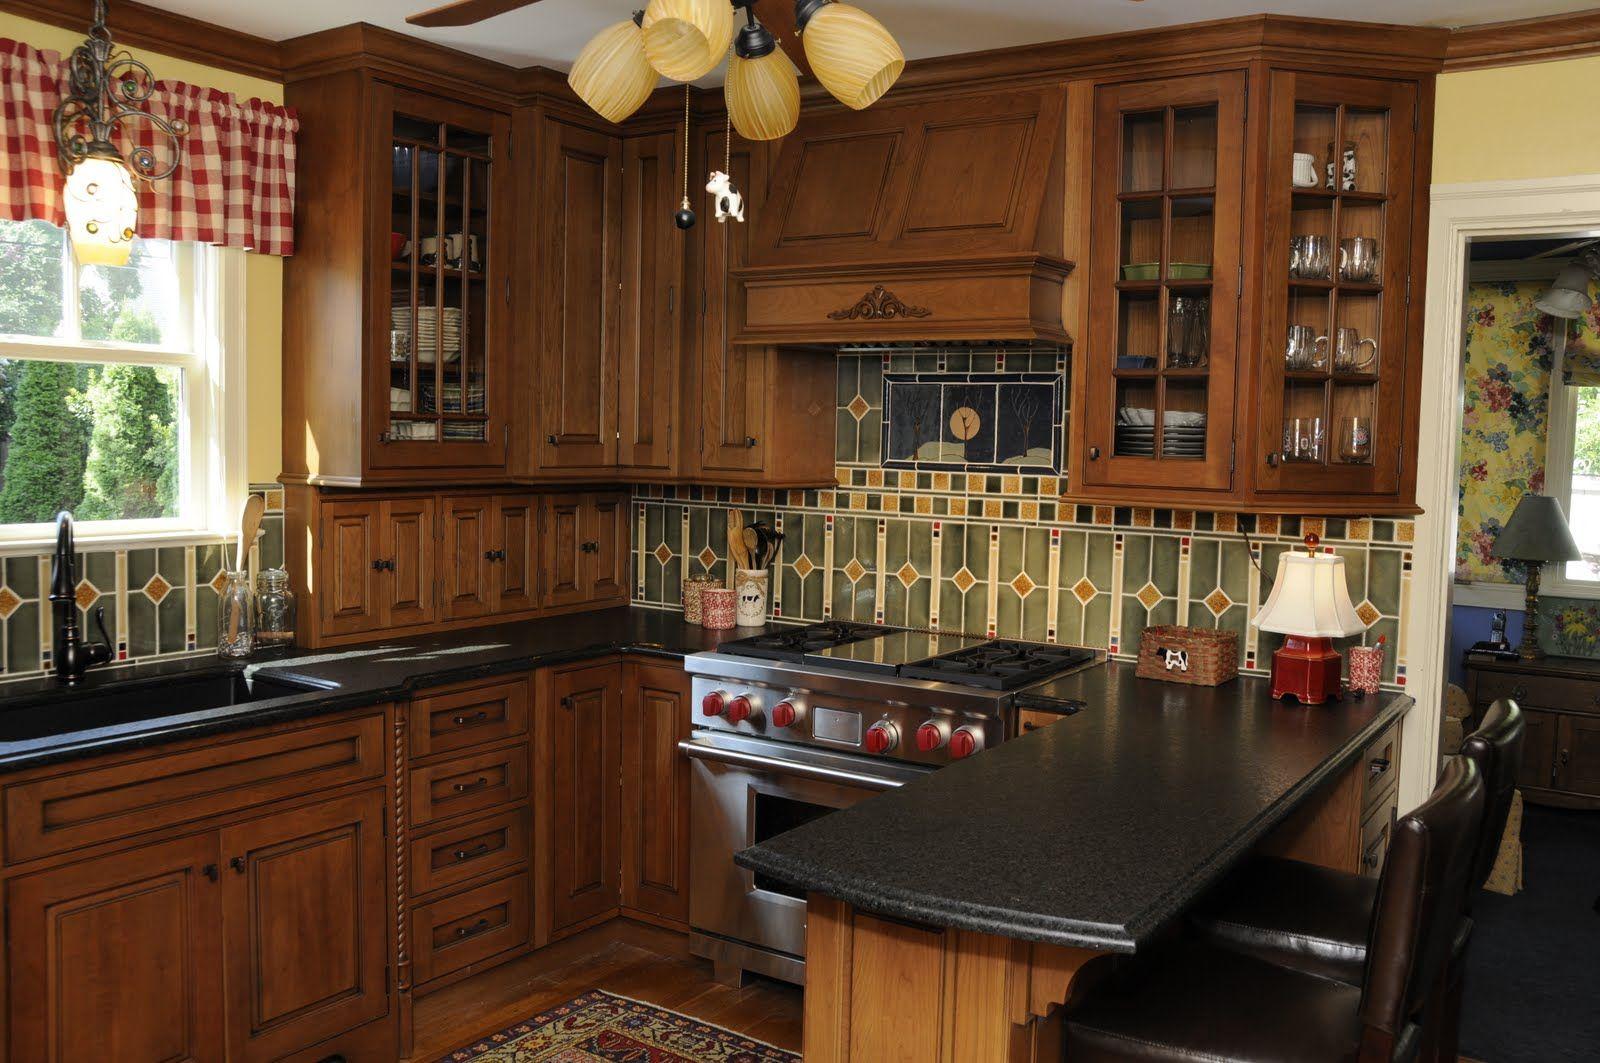 Craftsman Kitchen Backsplash Hells Apartments Arts And Crafts Crafting